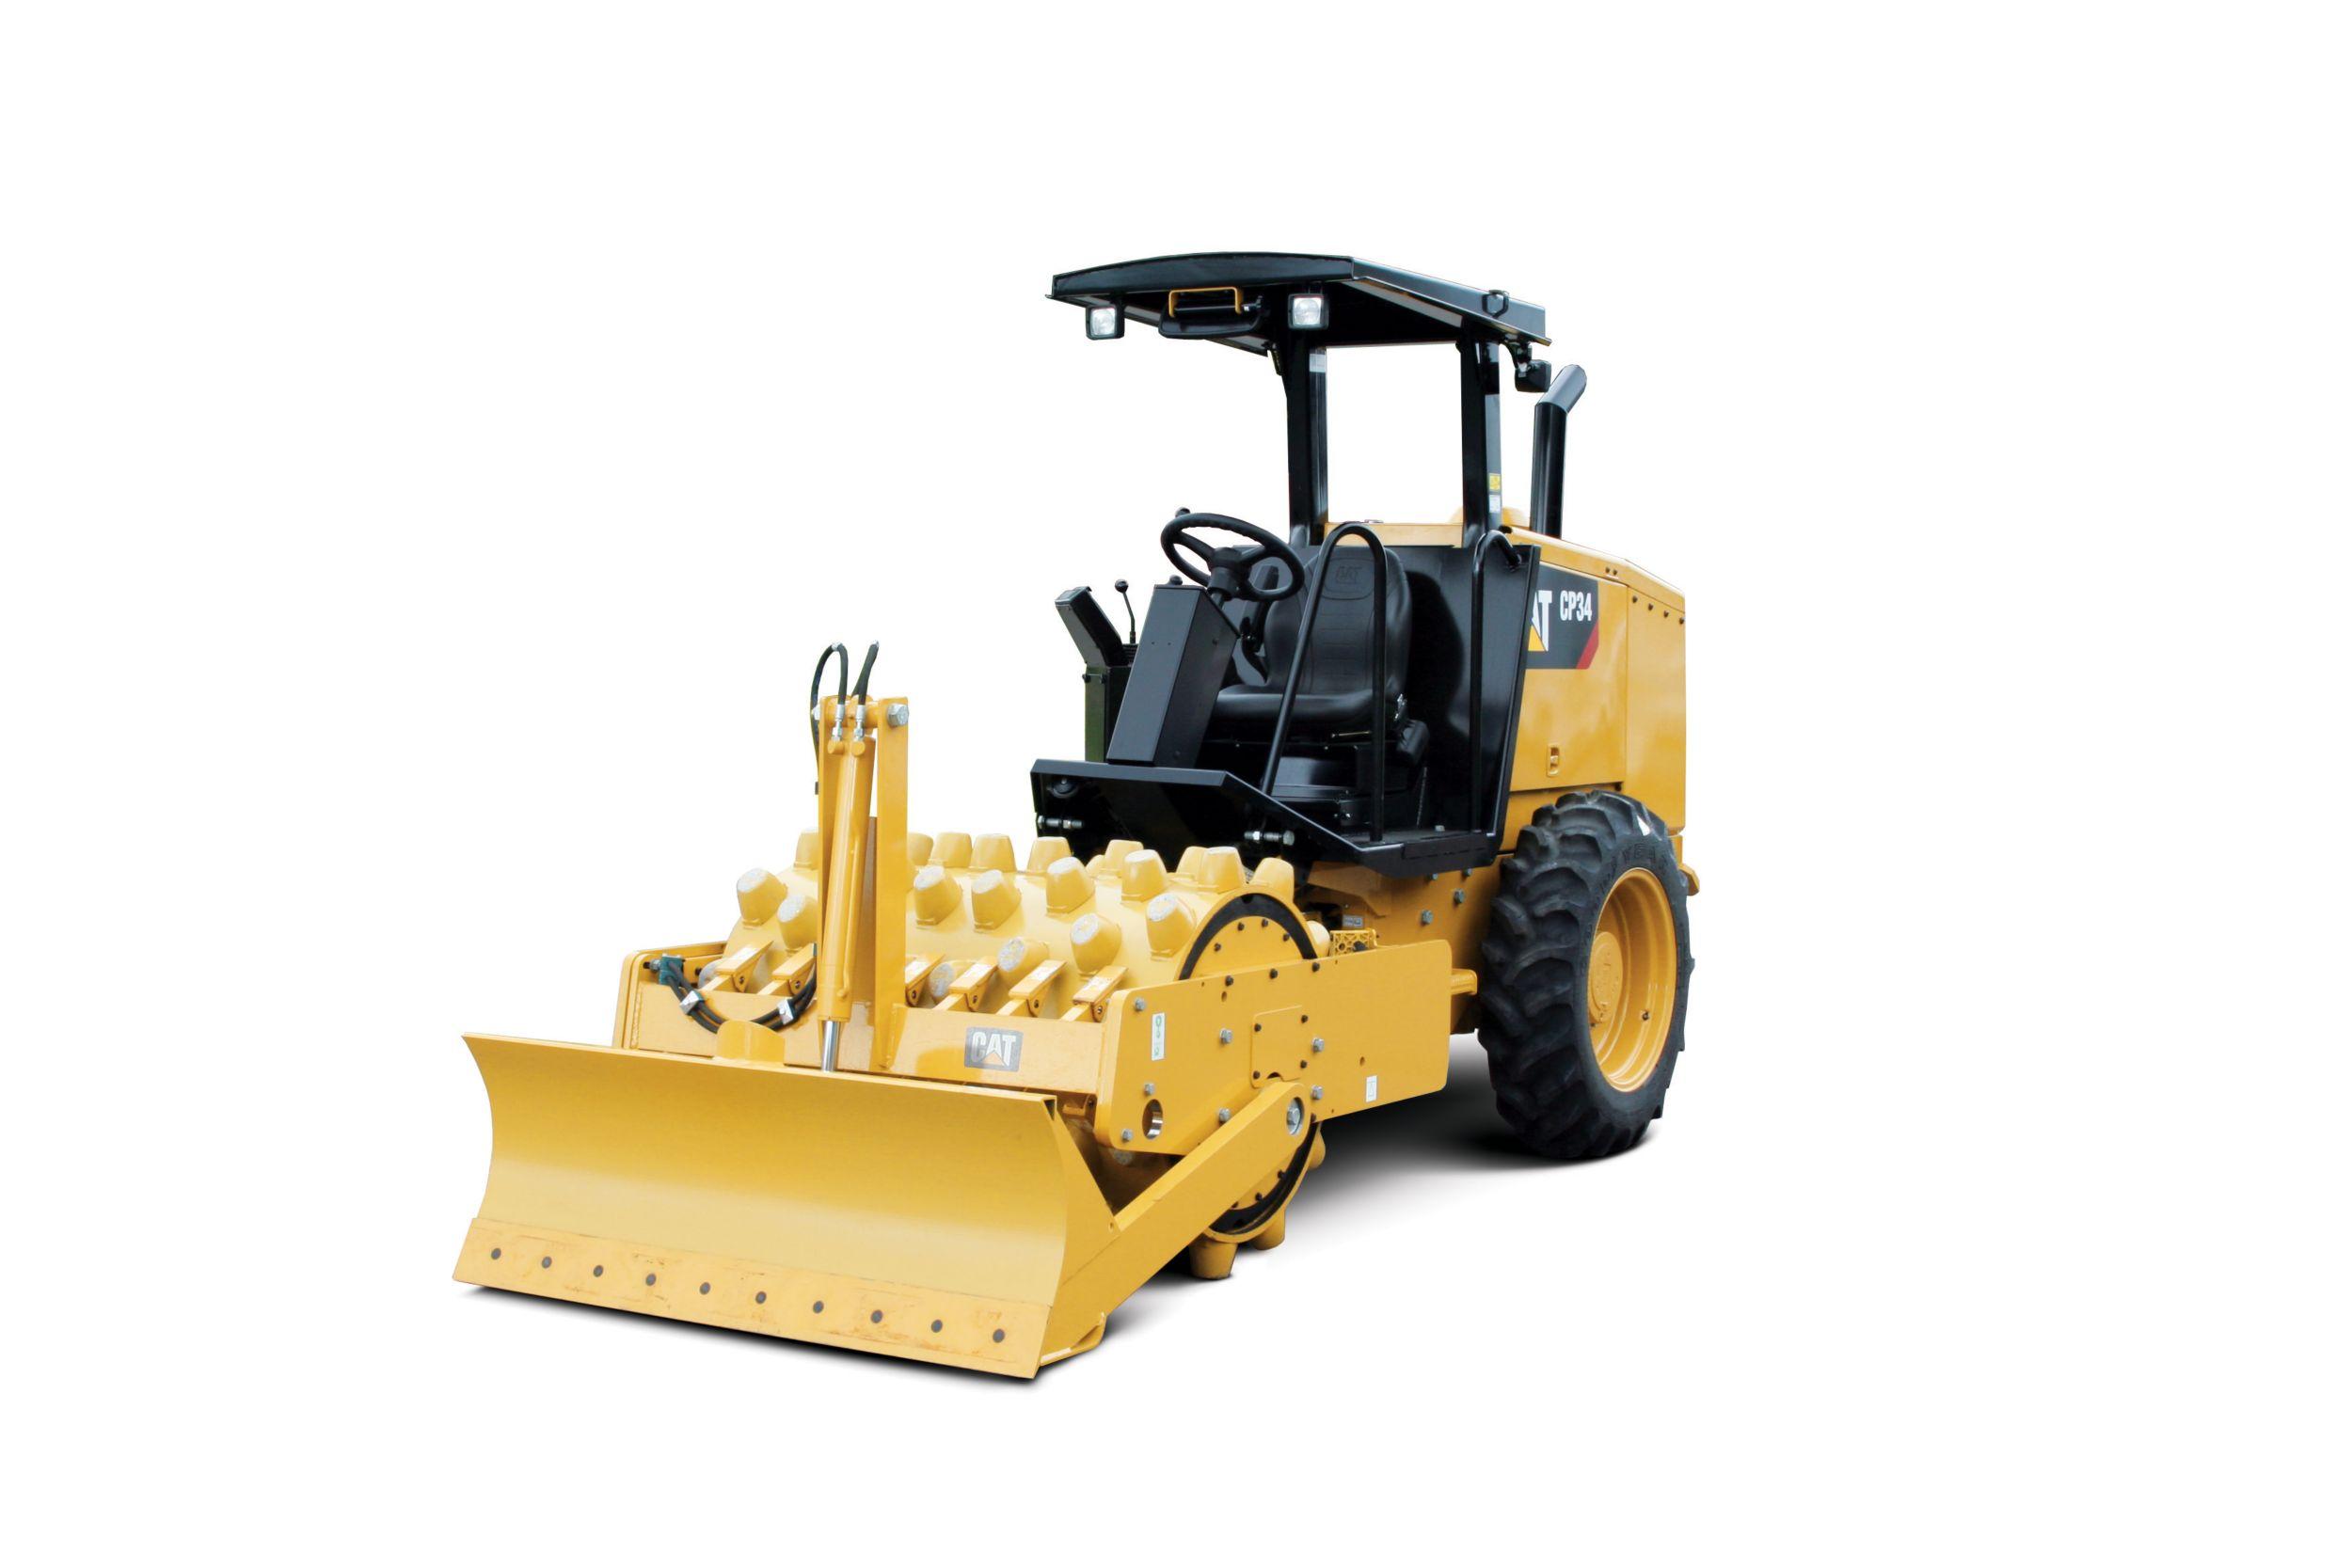 CP34 Vibratory Soil Compactor